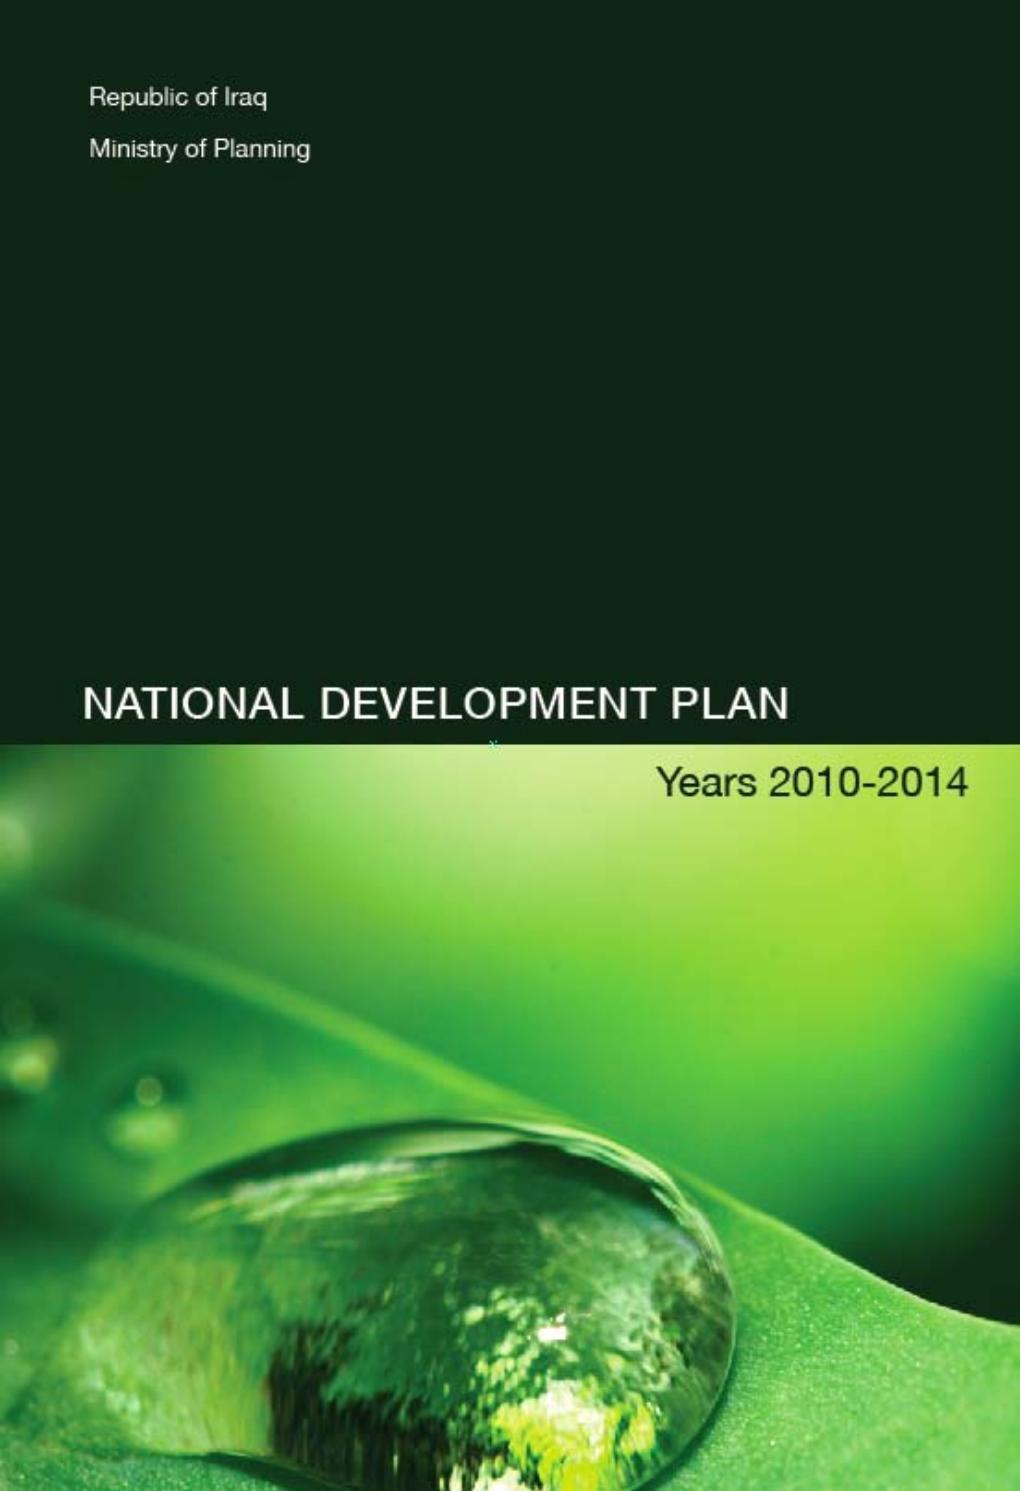 Iraq S National Development Plan 2010 2014 By Msi Worldwide Issuu